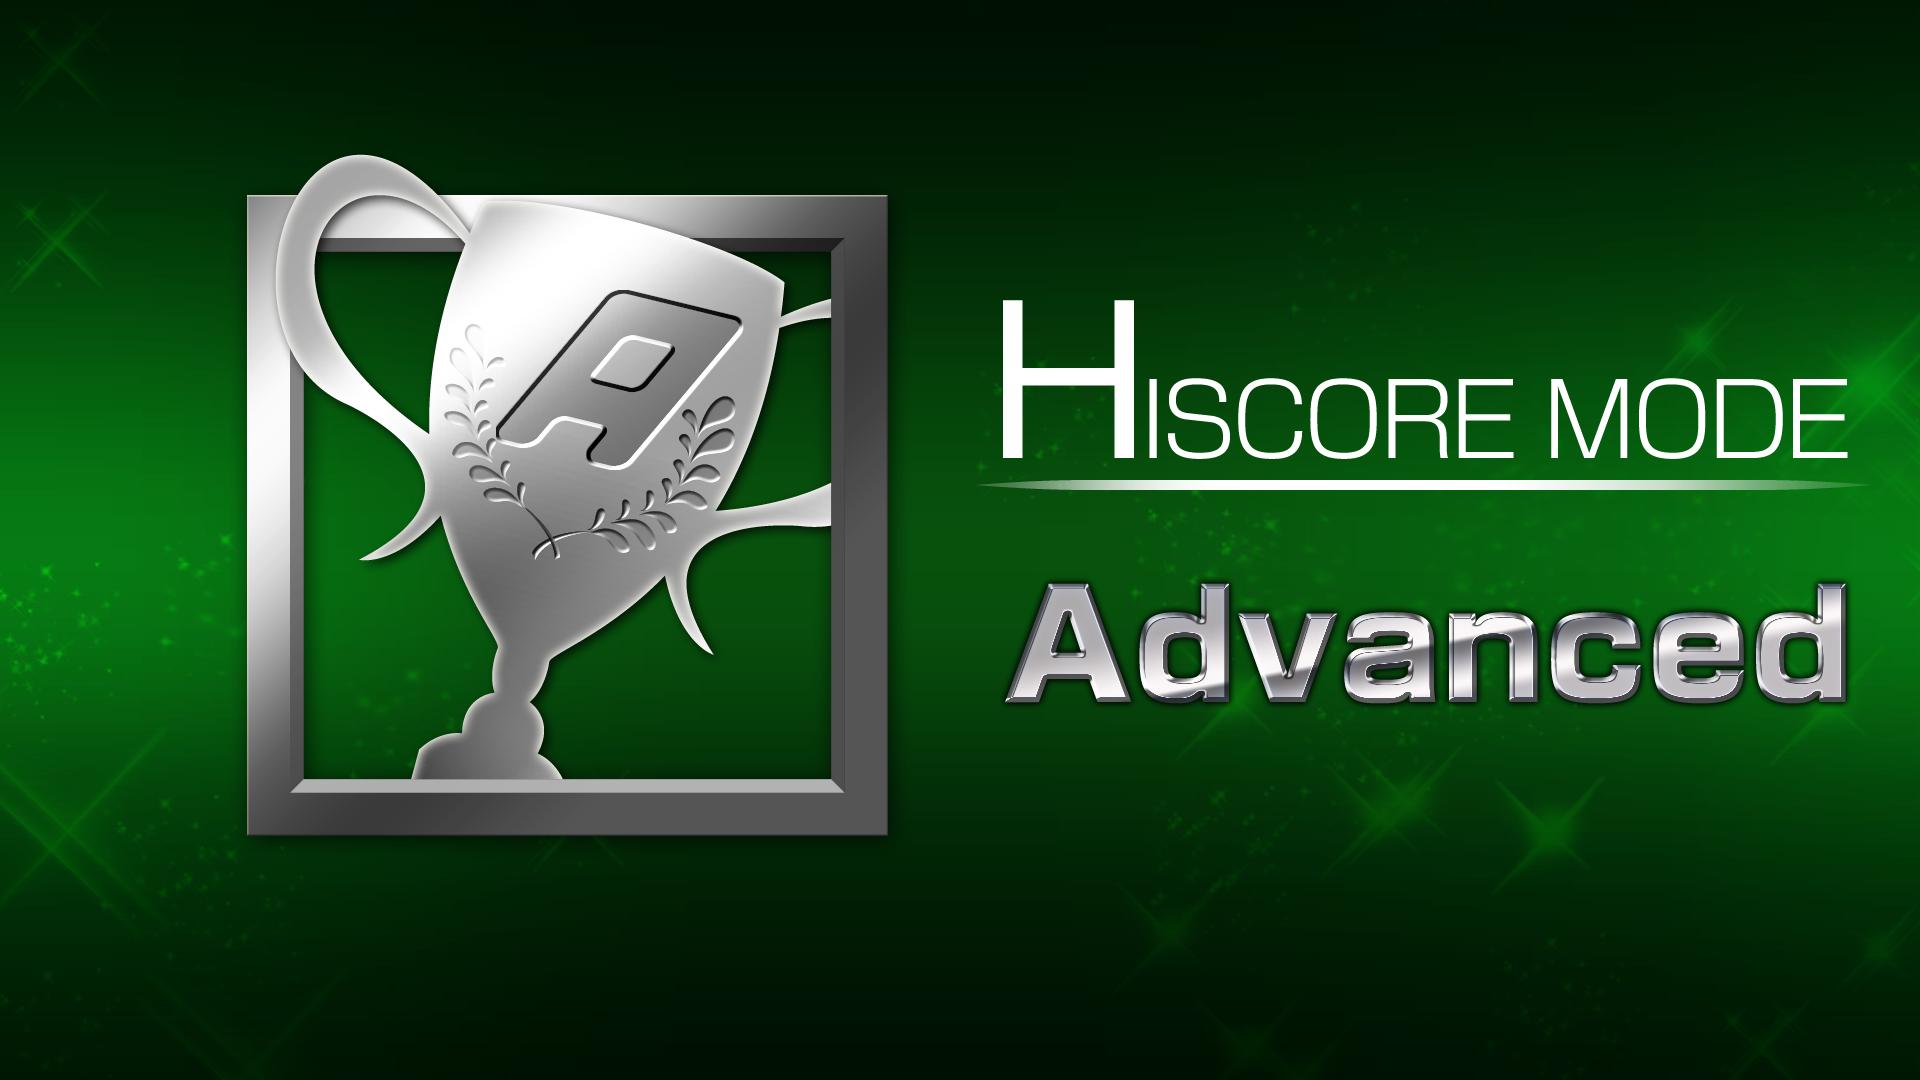 Icon for HI SCORE MODE 600 points